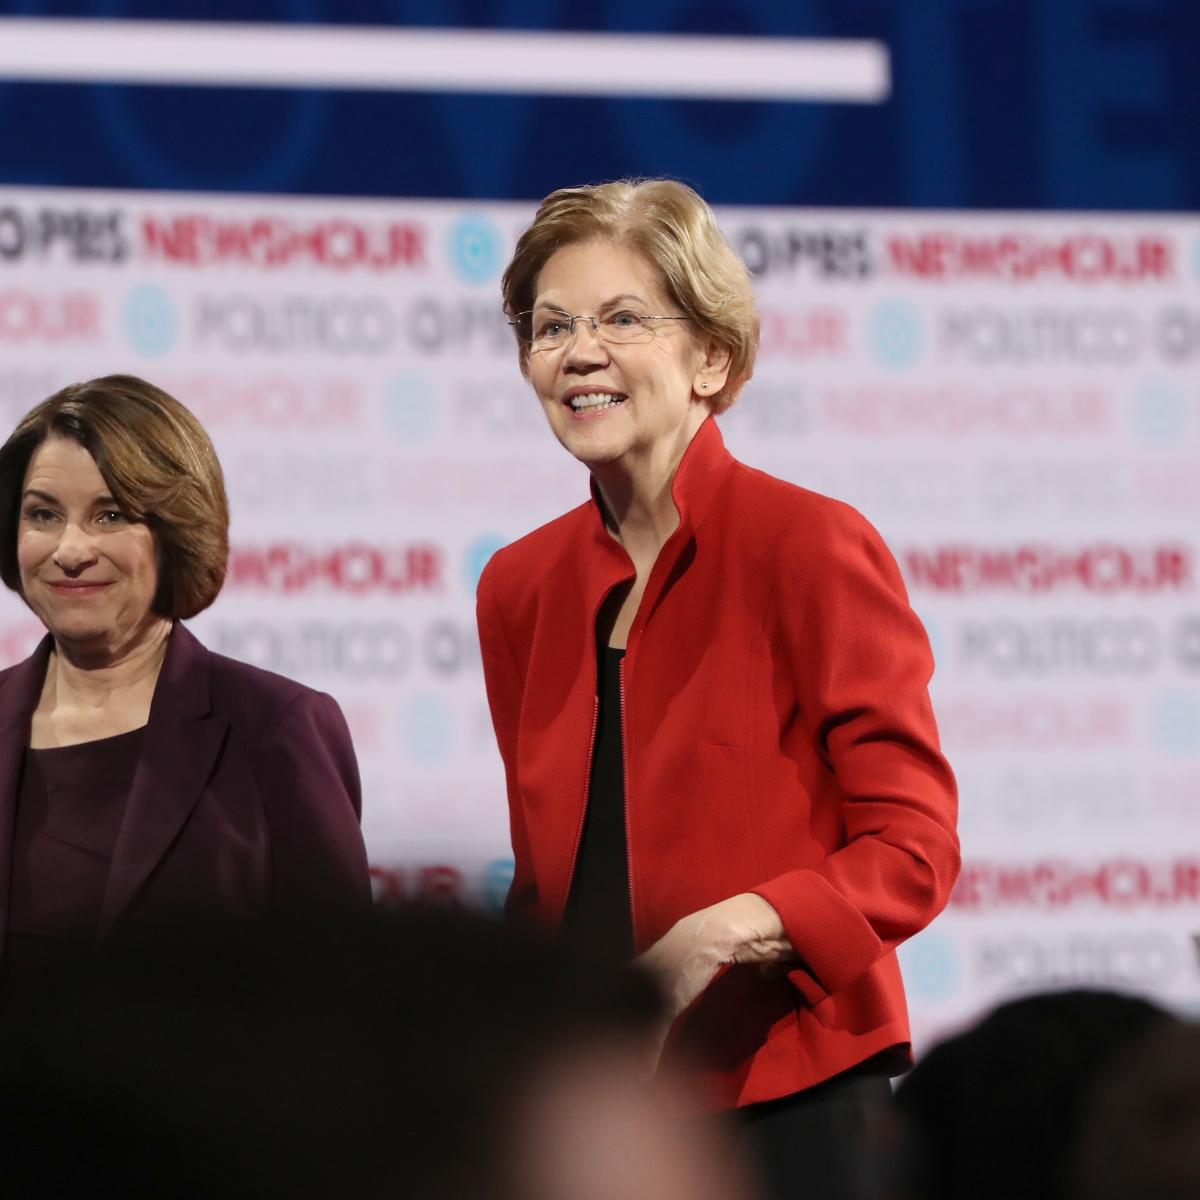 US 2020: Democratic hopeful Elizabeth Warren drops out after Tuesday rout